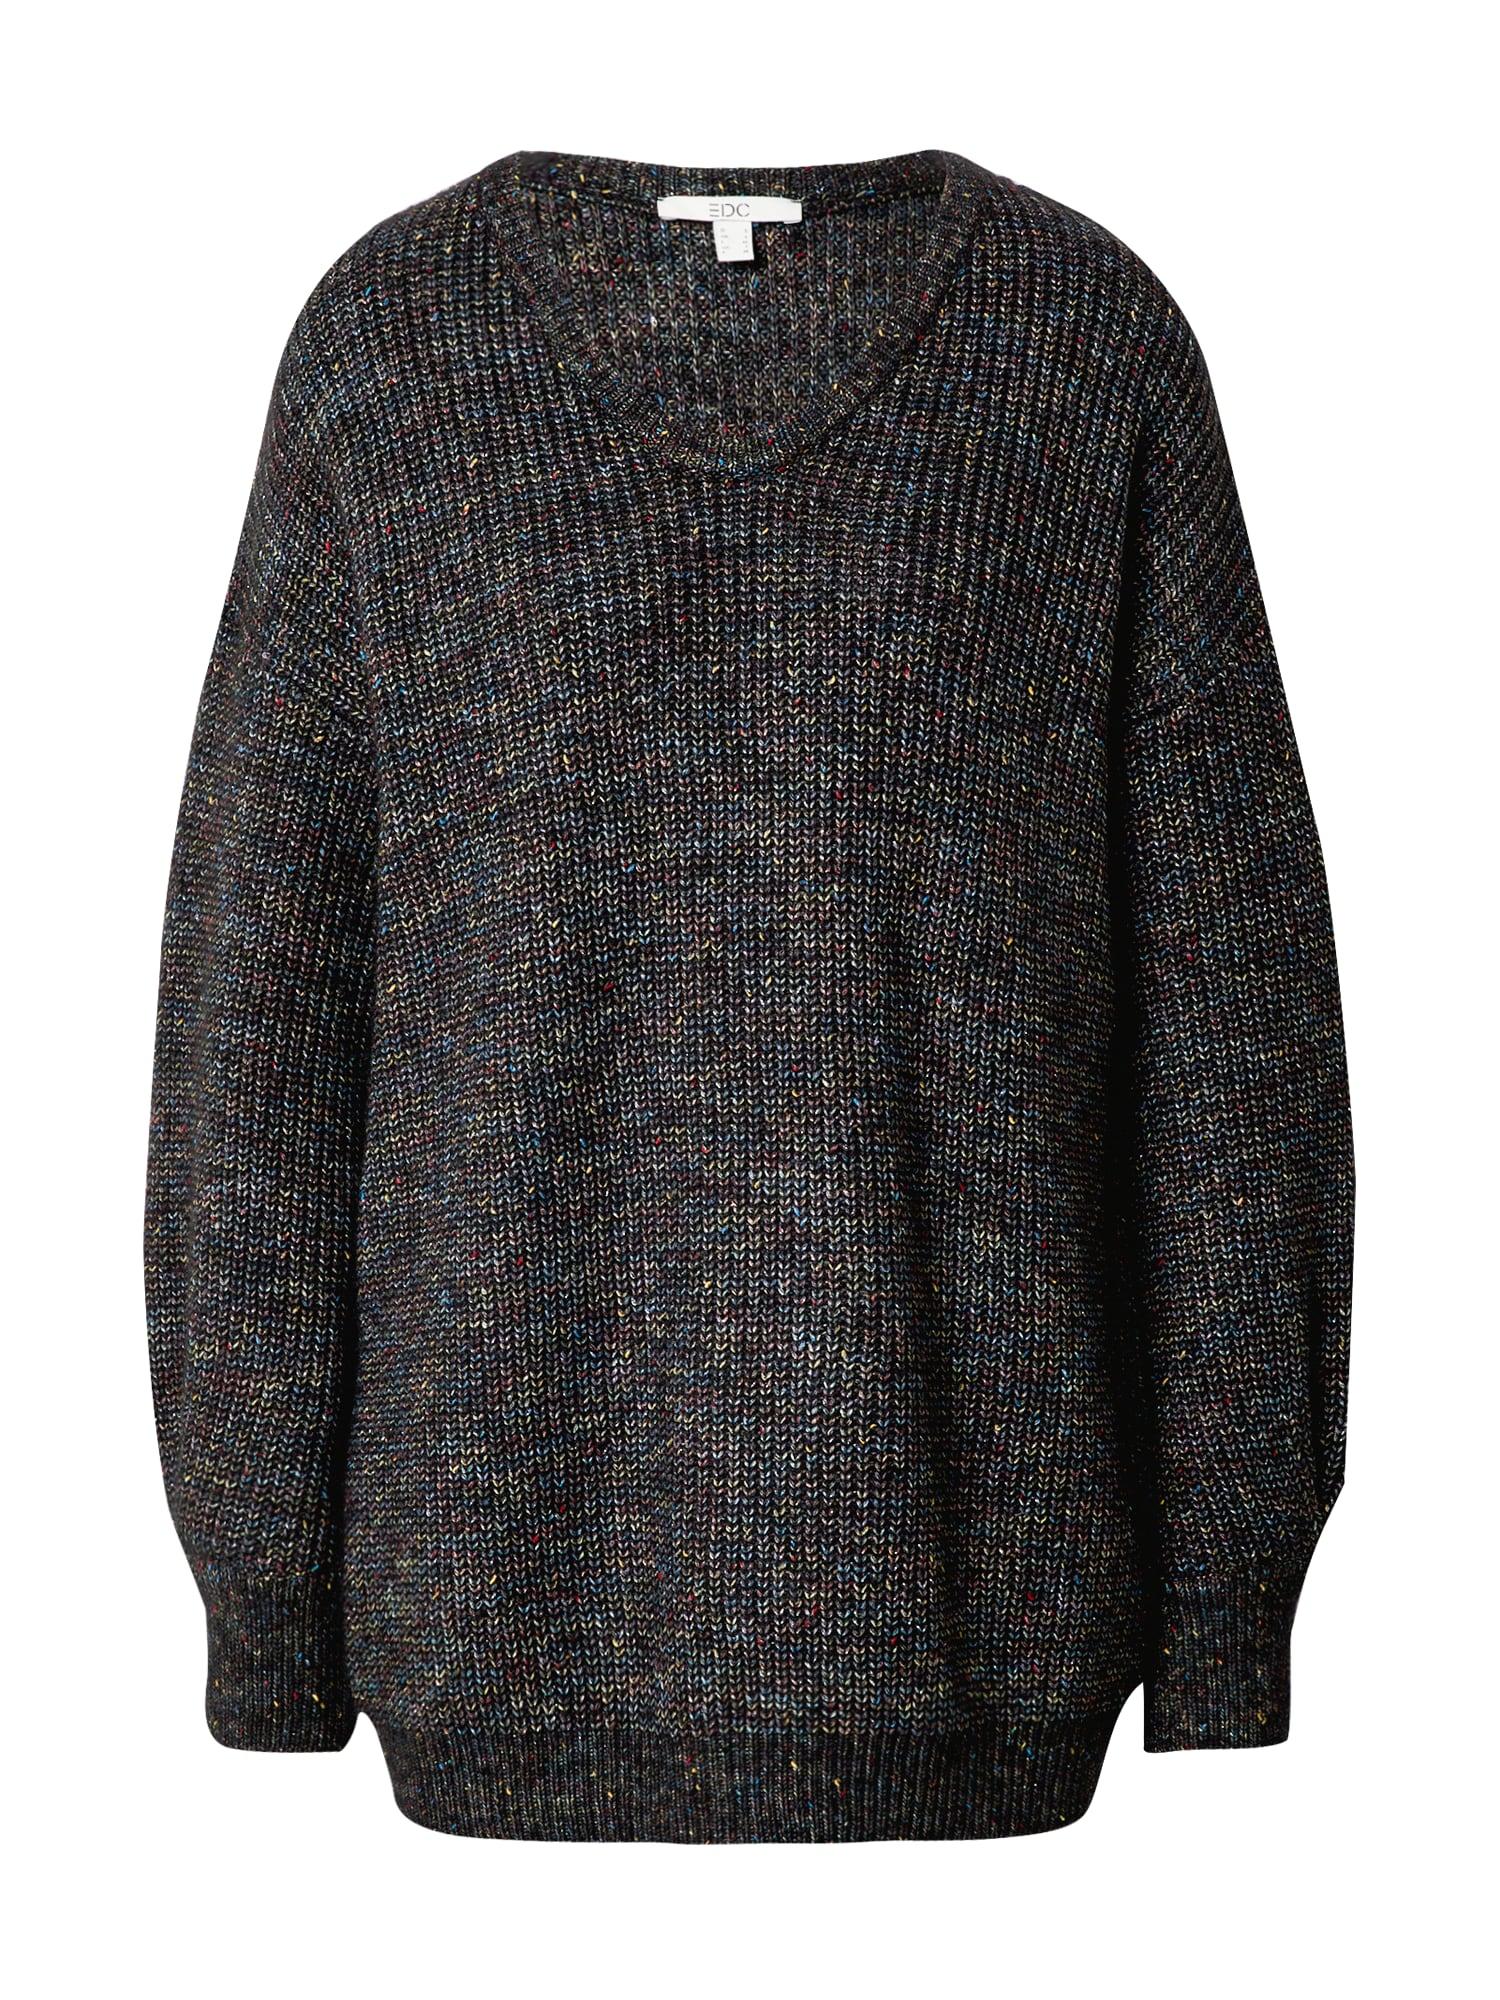 EDC BY ESPRIT Laisvas megztinis tamsiai pilka